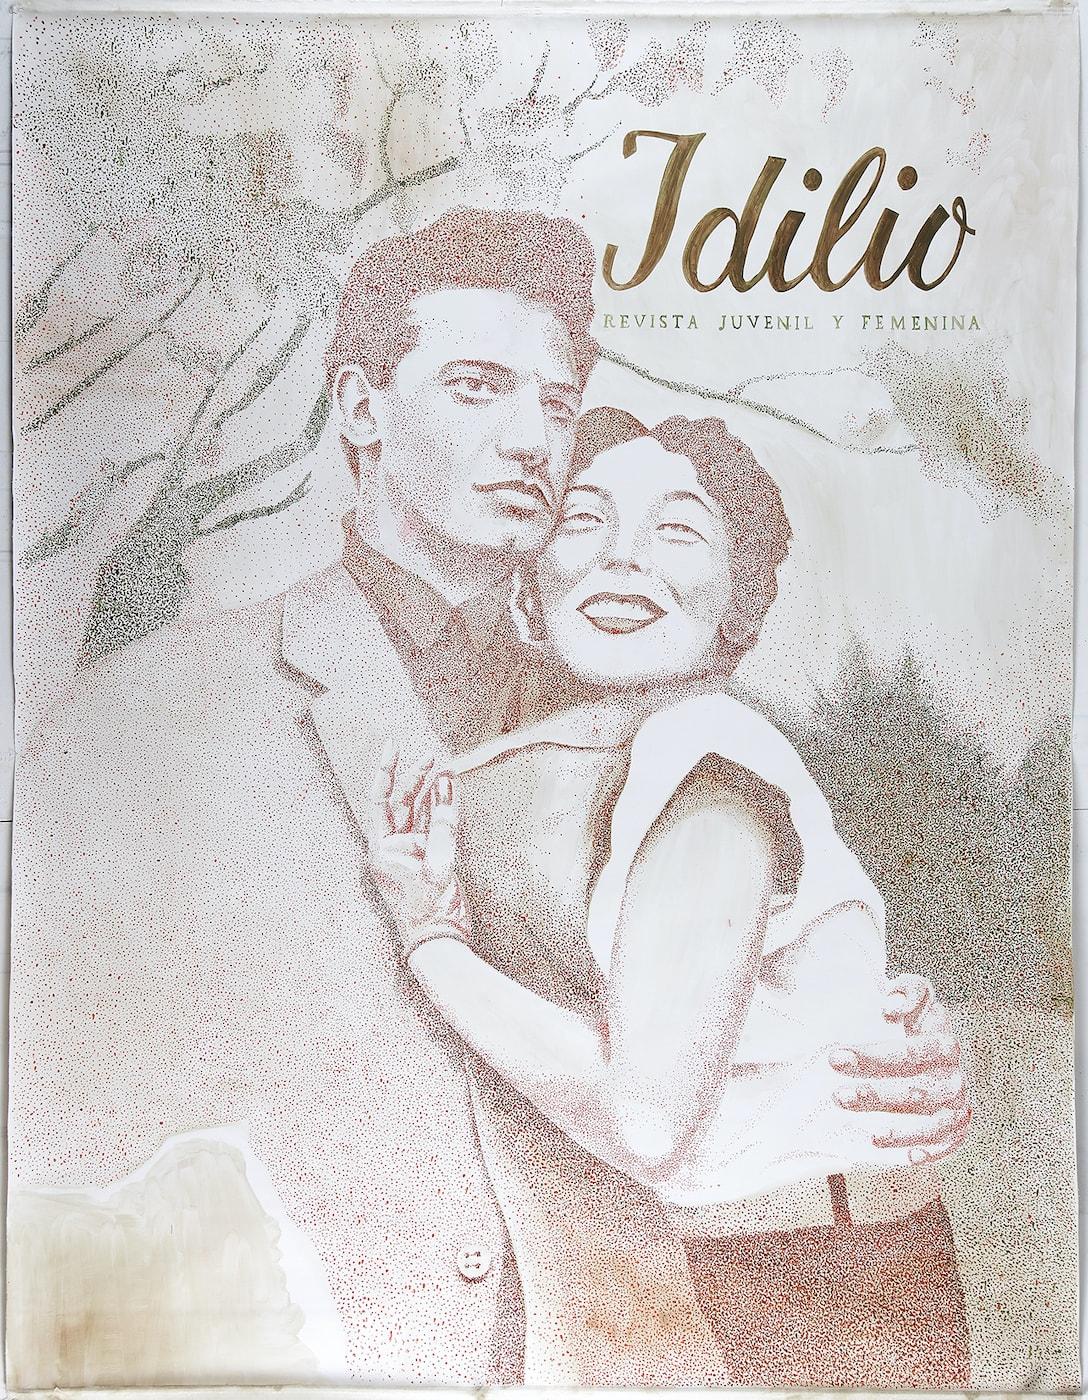 gonzalo-elvira-Idilio-2019-Óleo-sobre-tela-200-x-150-cm-